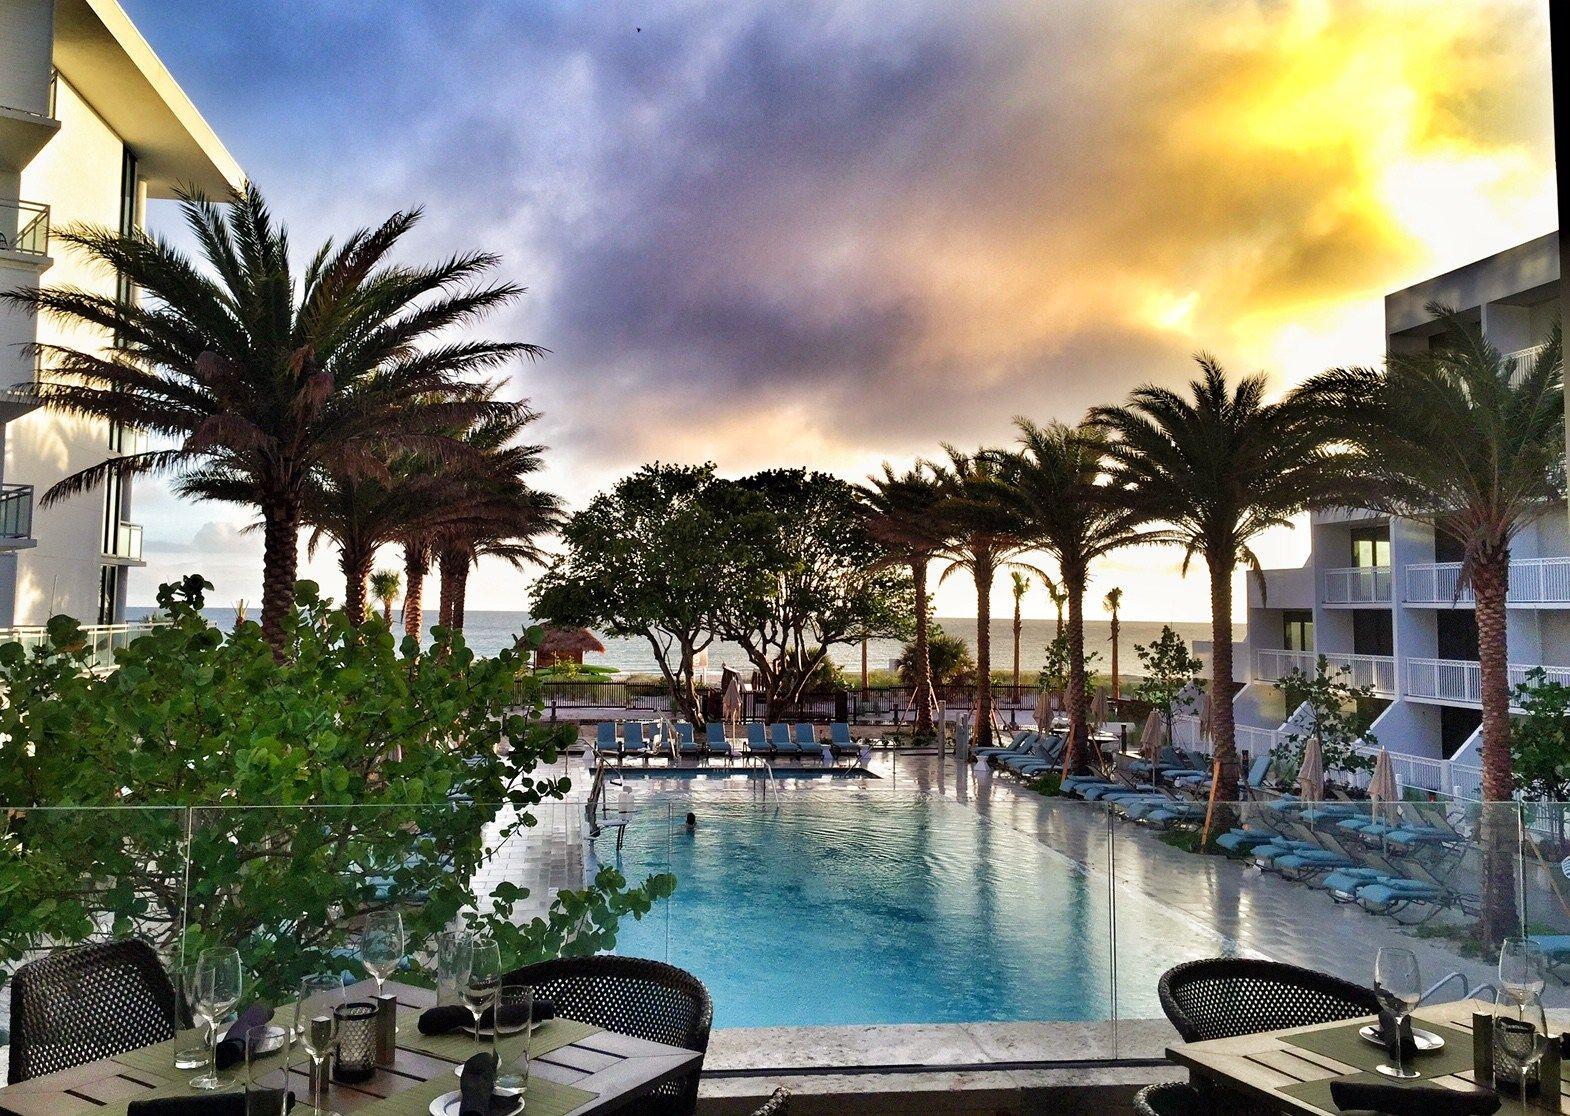 Zota Beach Resort In Longboat Key Florida Review Photos Acupful Travel Blog By Mandy Carter Sarasota Vacation